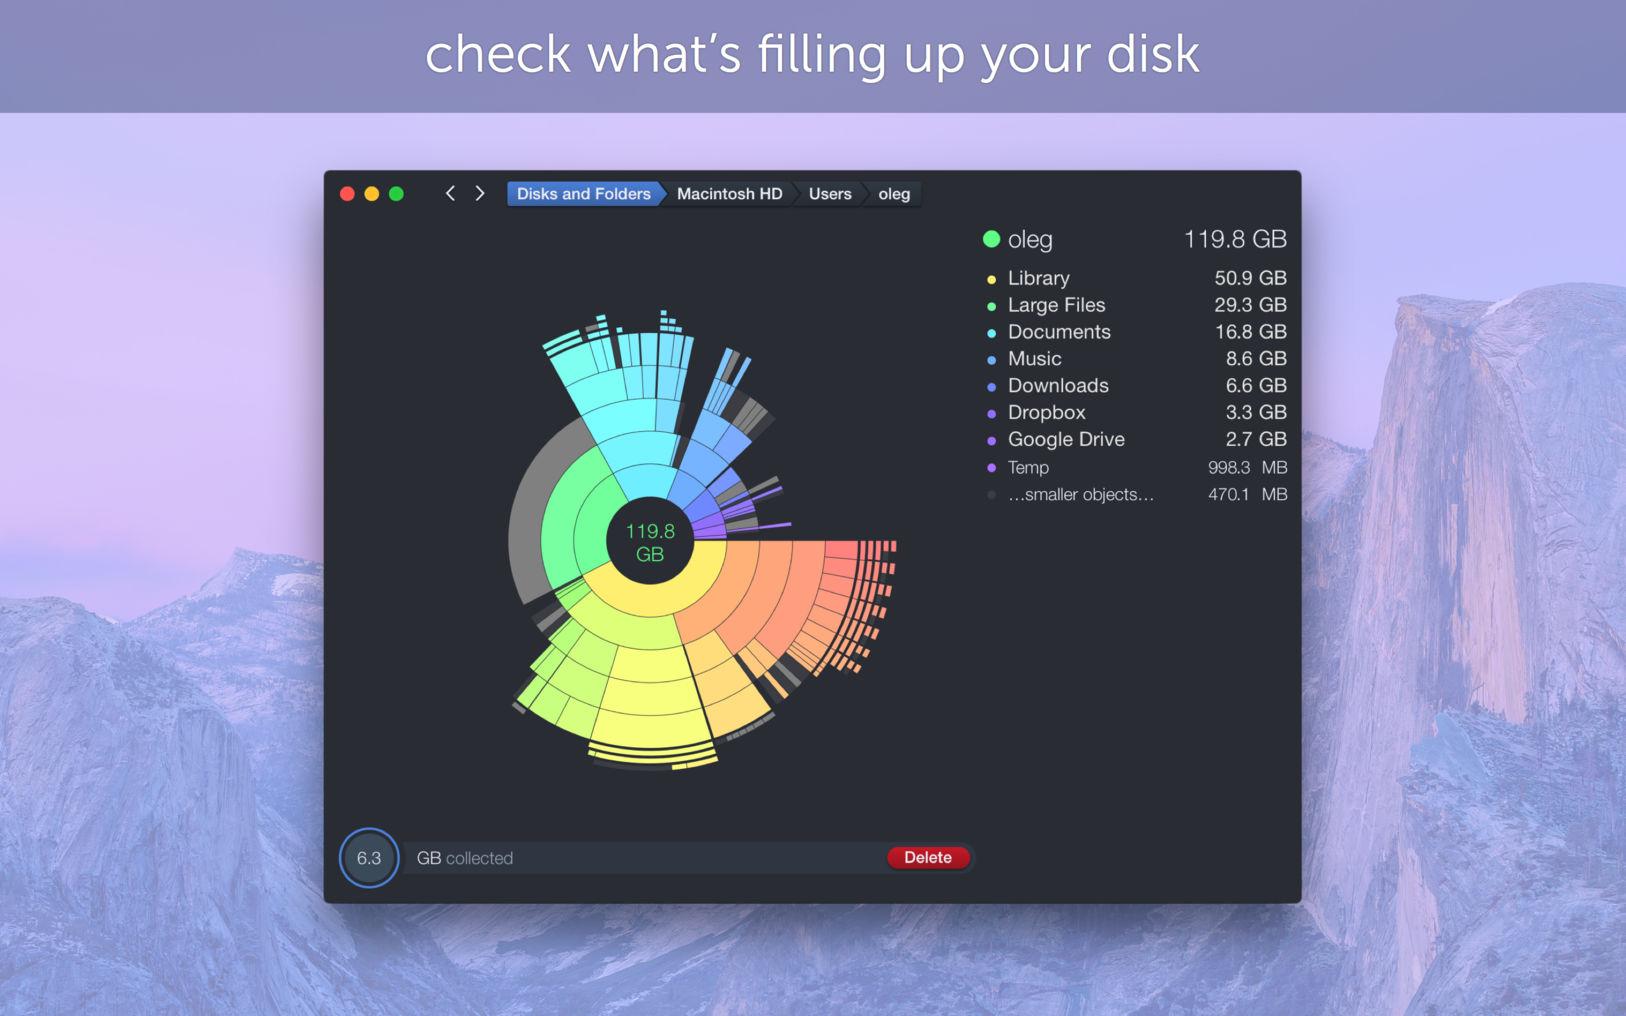 DaisyDisk 4.6.5